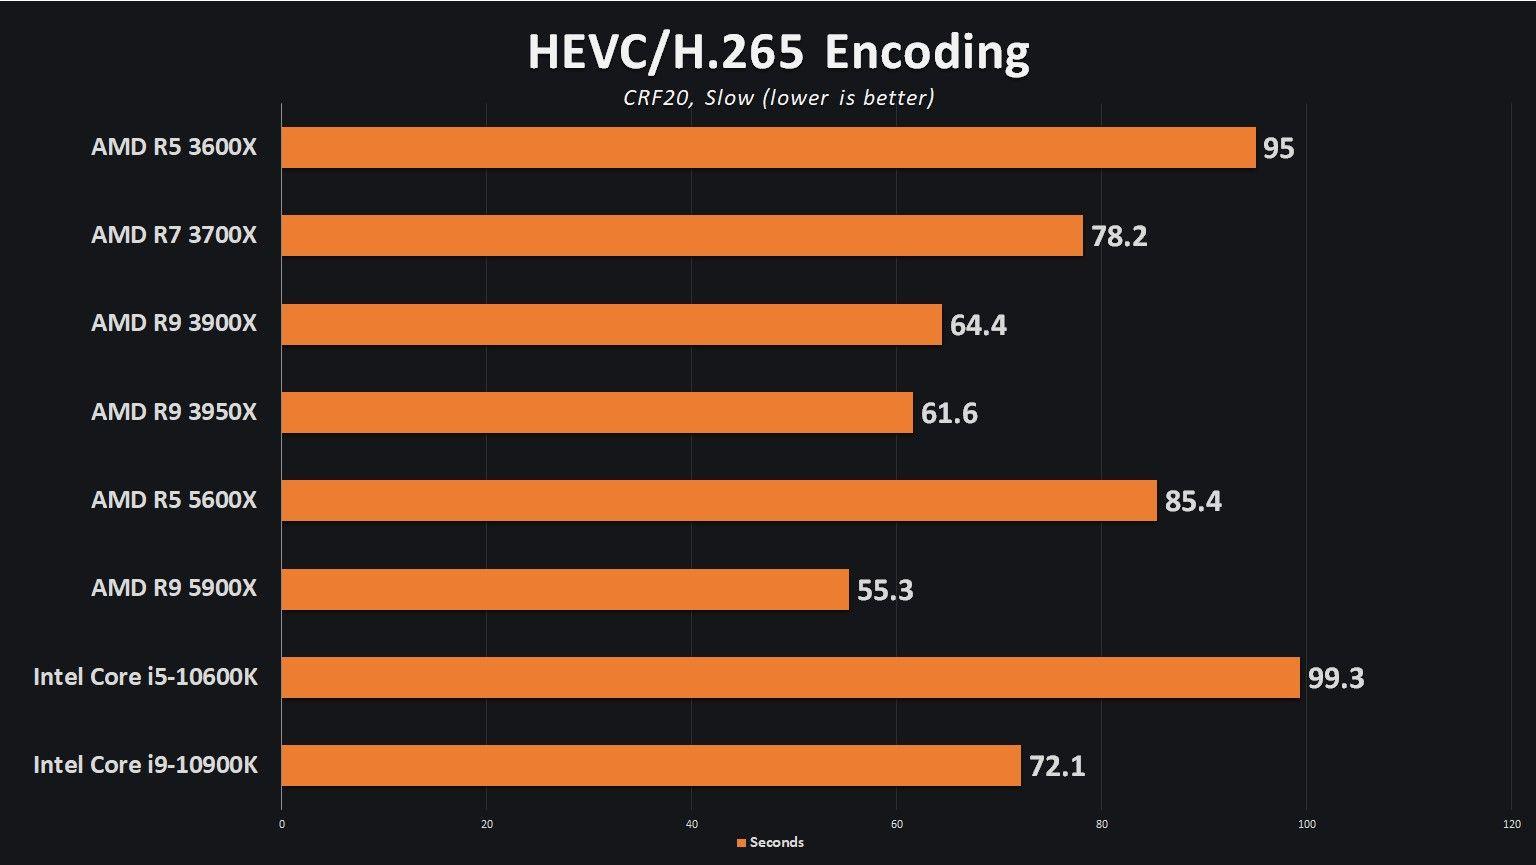 Encoding Benchmark